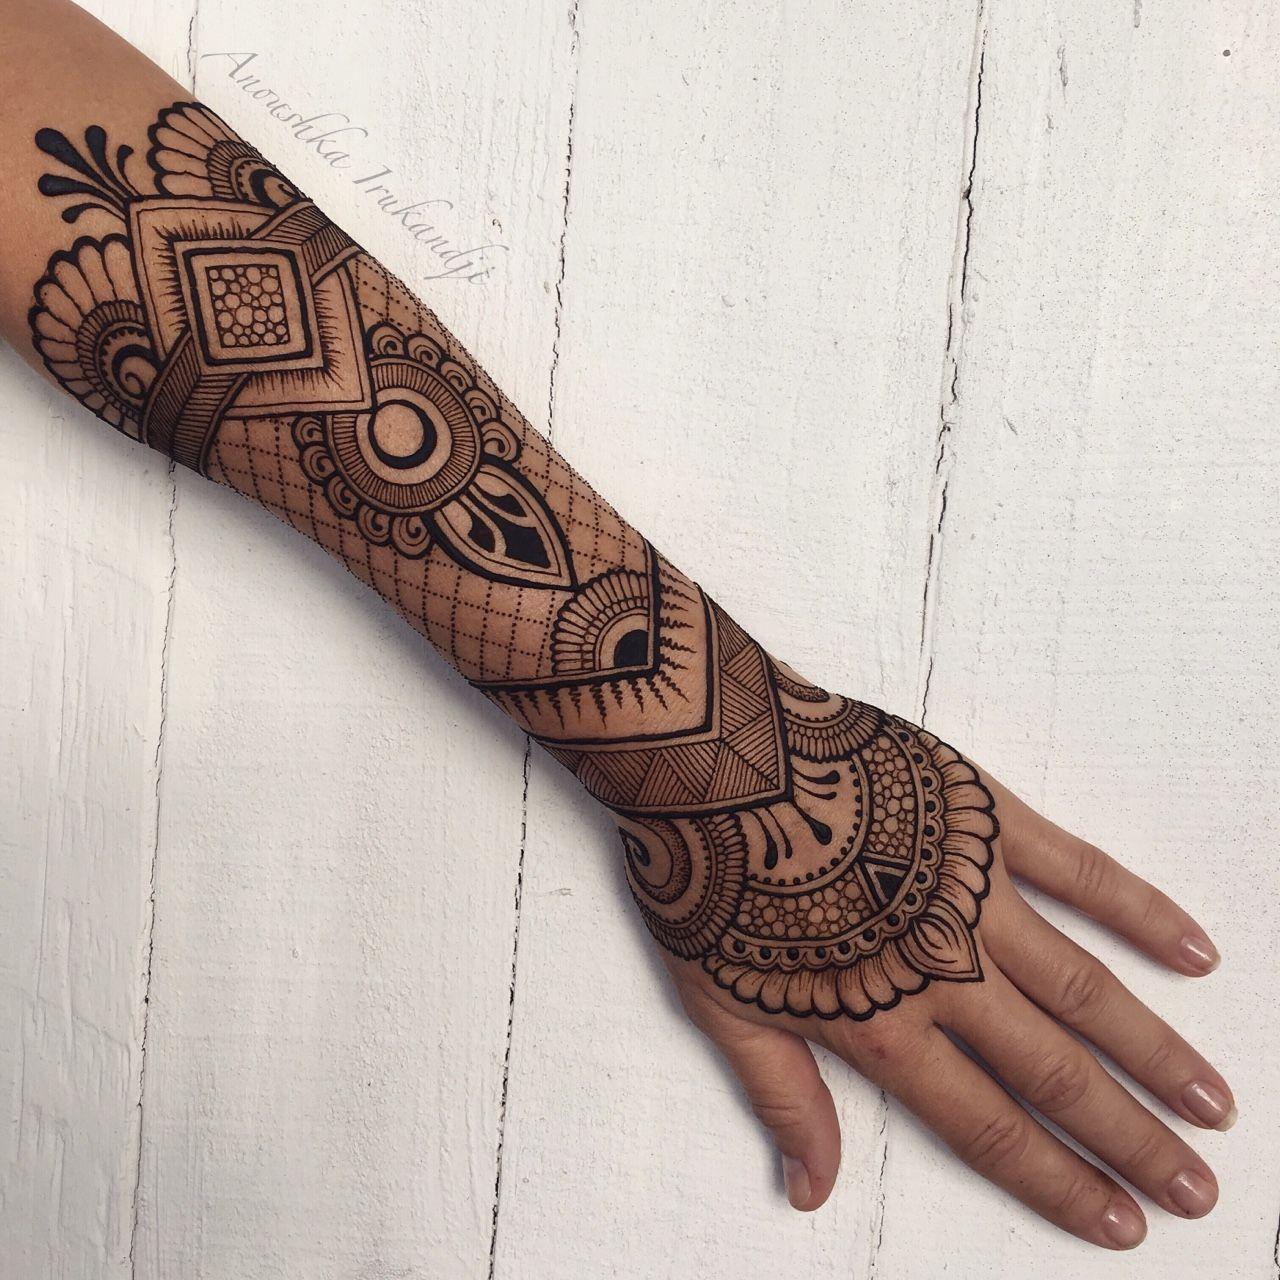 Mehndi Tattoo Sleeve: Henna, Henna Tattoo Designs, Henna Sleeve